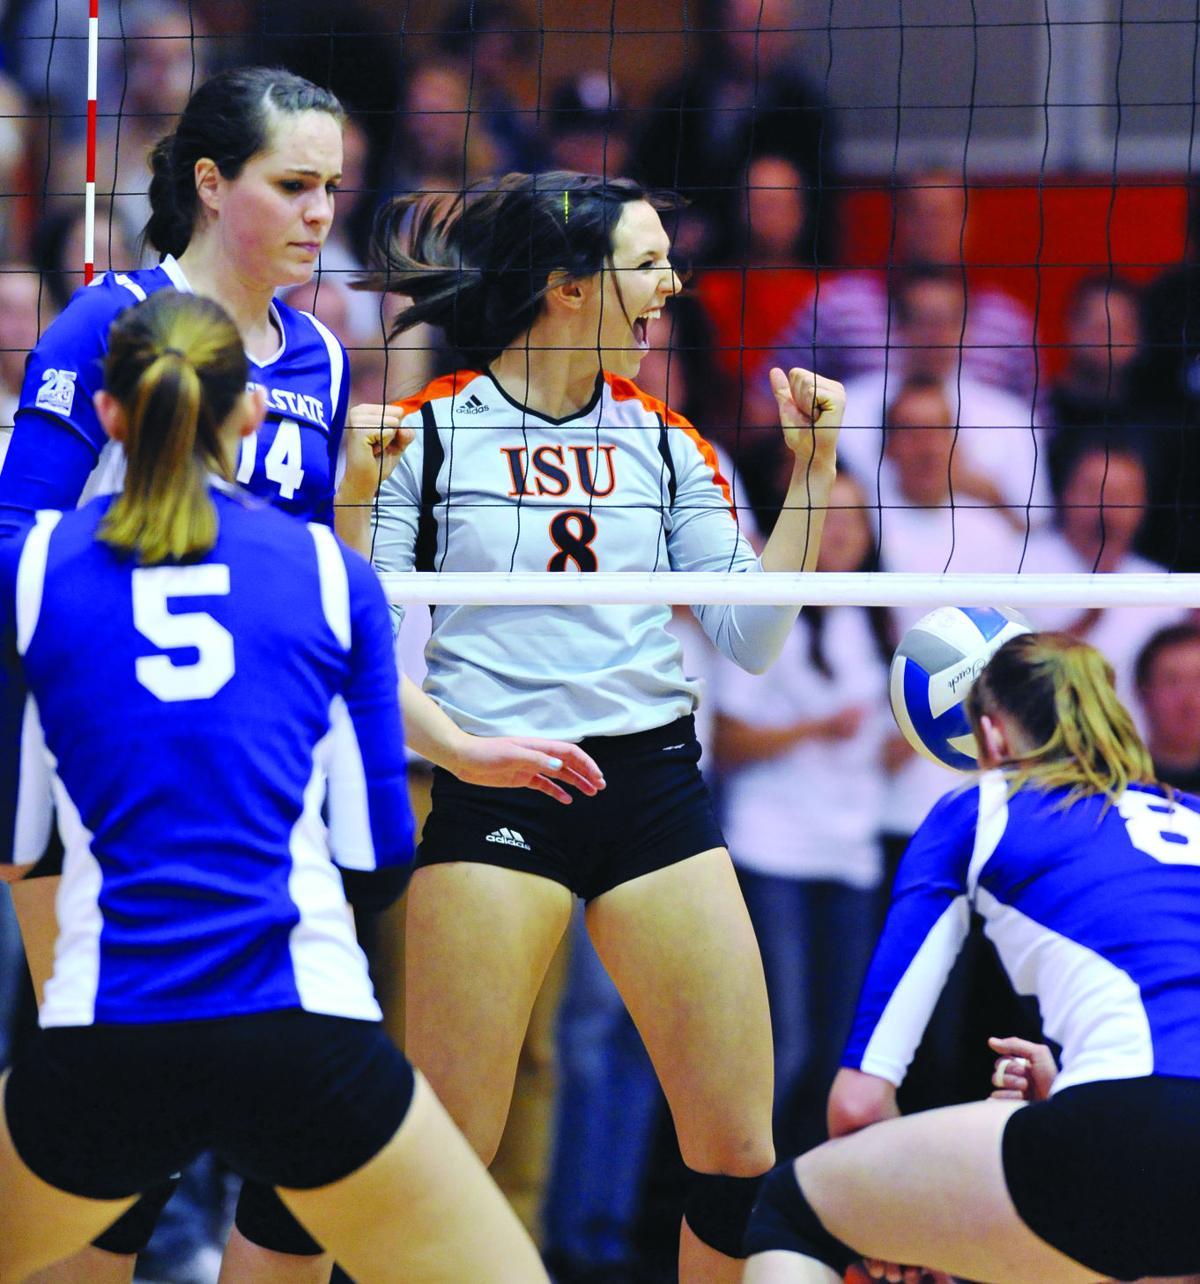 Isu Volleyball Idaho State Volleyball Picked To Win The Big Sky Isu Idahostatejournal Com